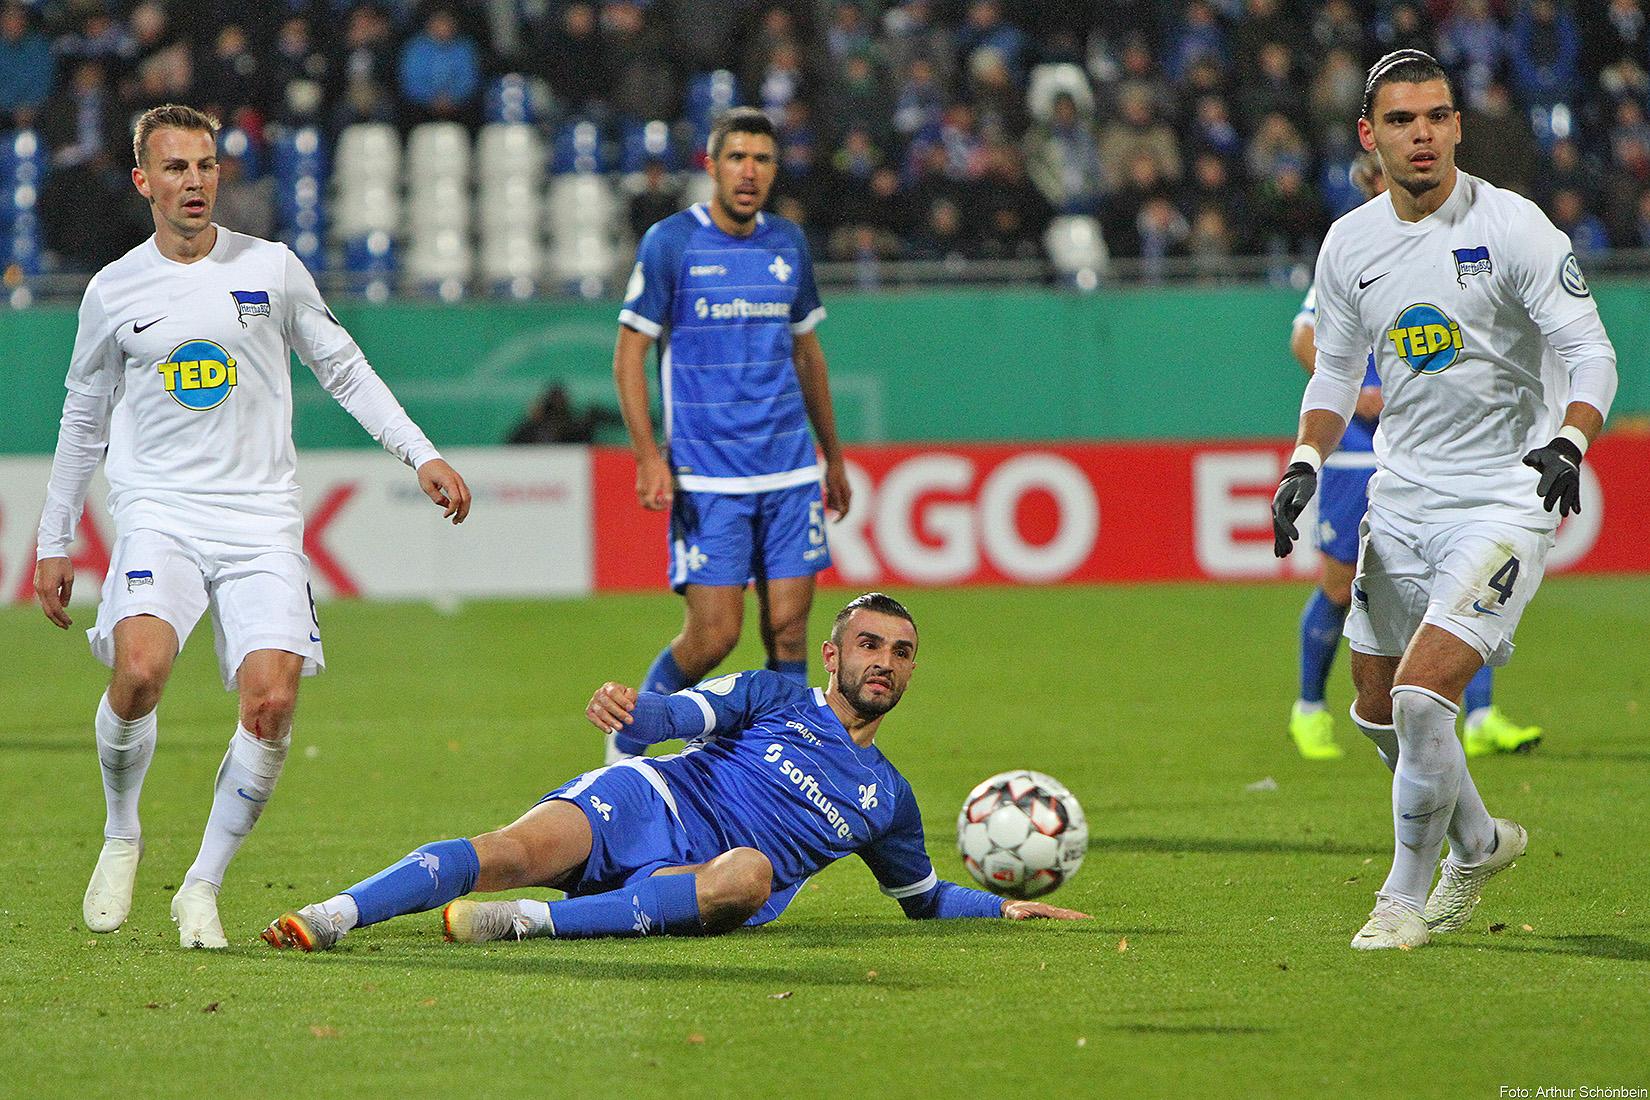 SV Darmstadt 98 – Hertha BSC 0:2 (0:0)